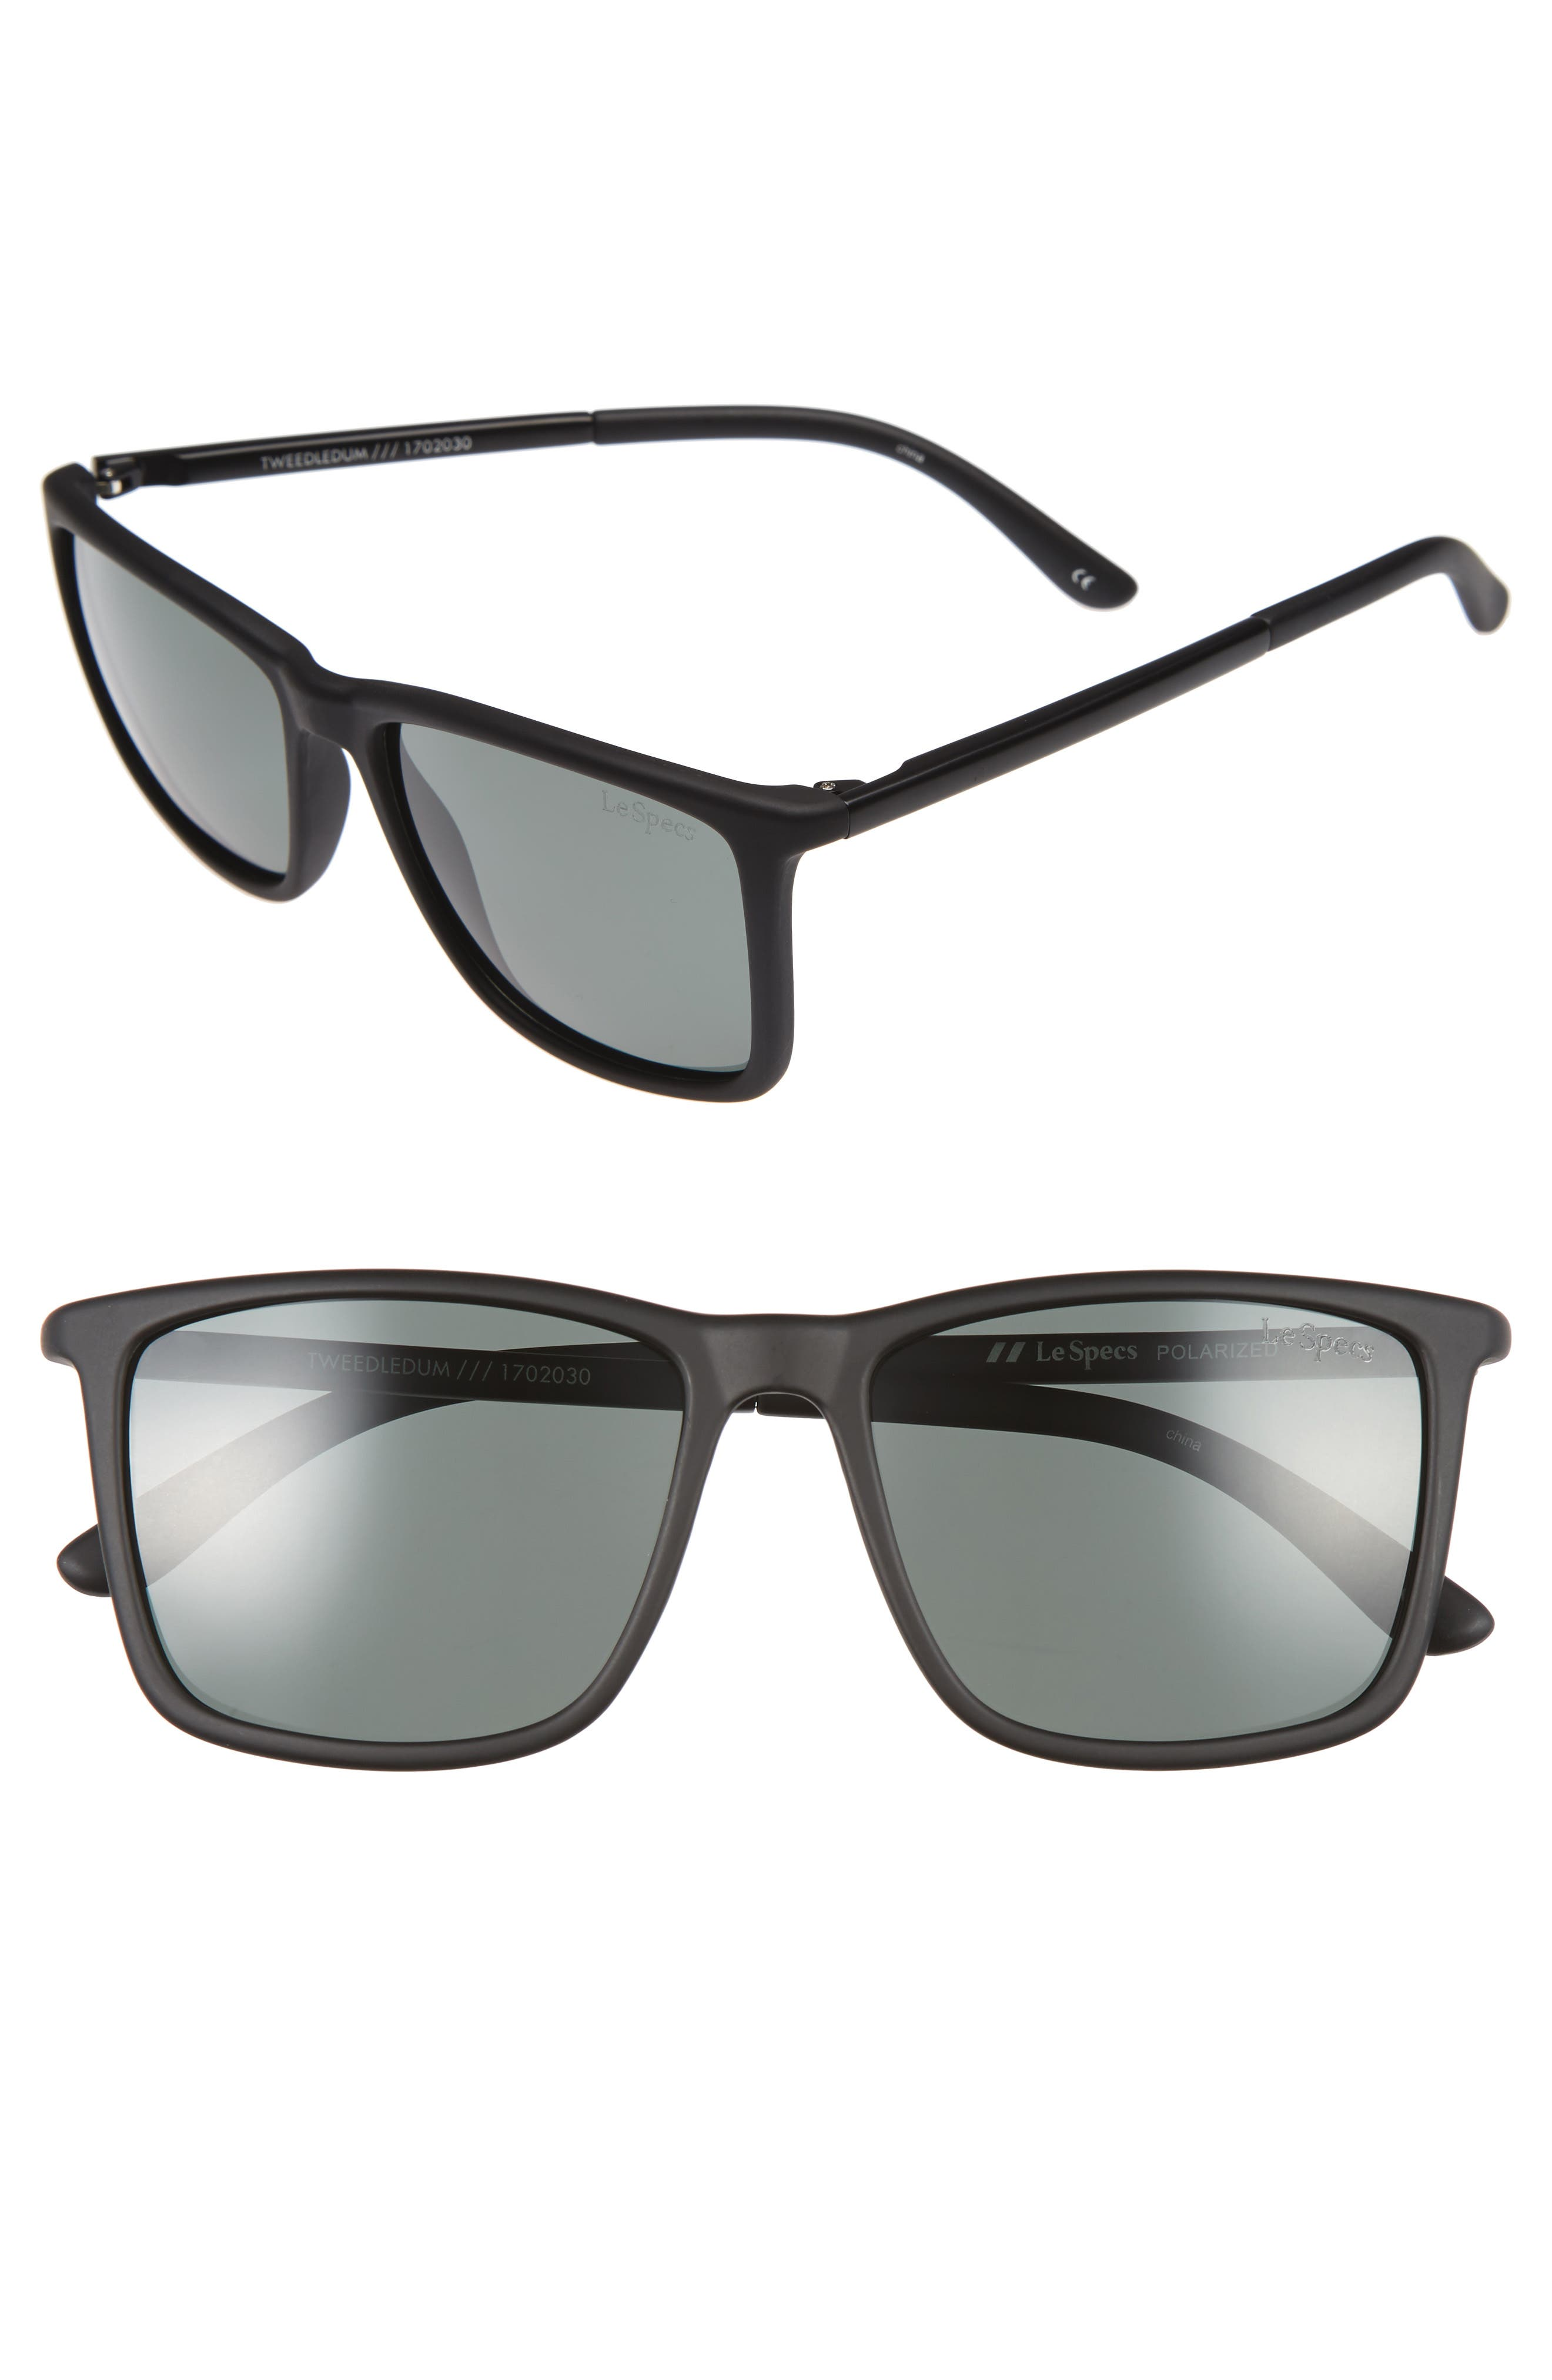 Le Specs Tweedledum 55mm Polarized Sunglasses